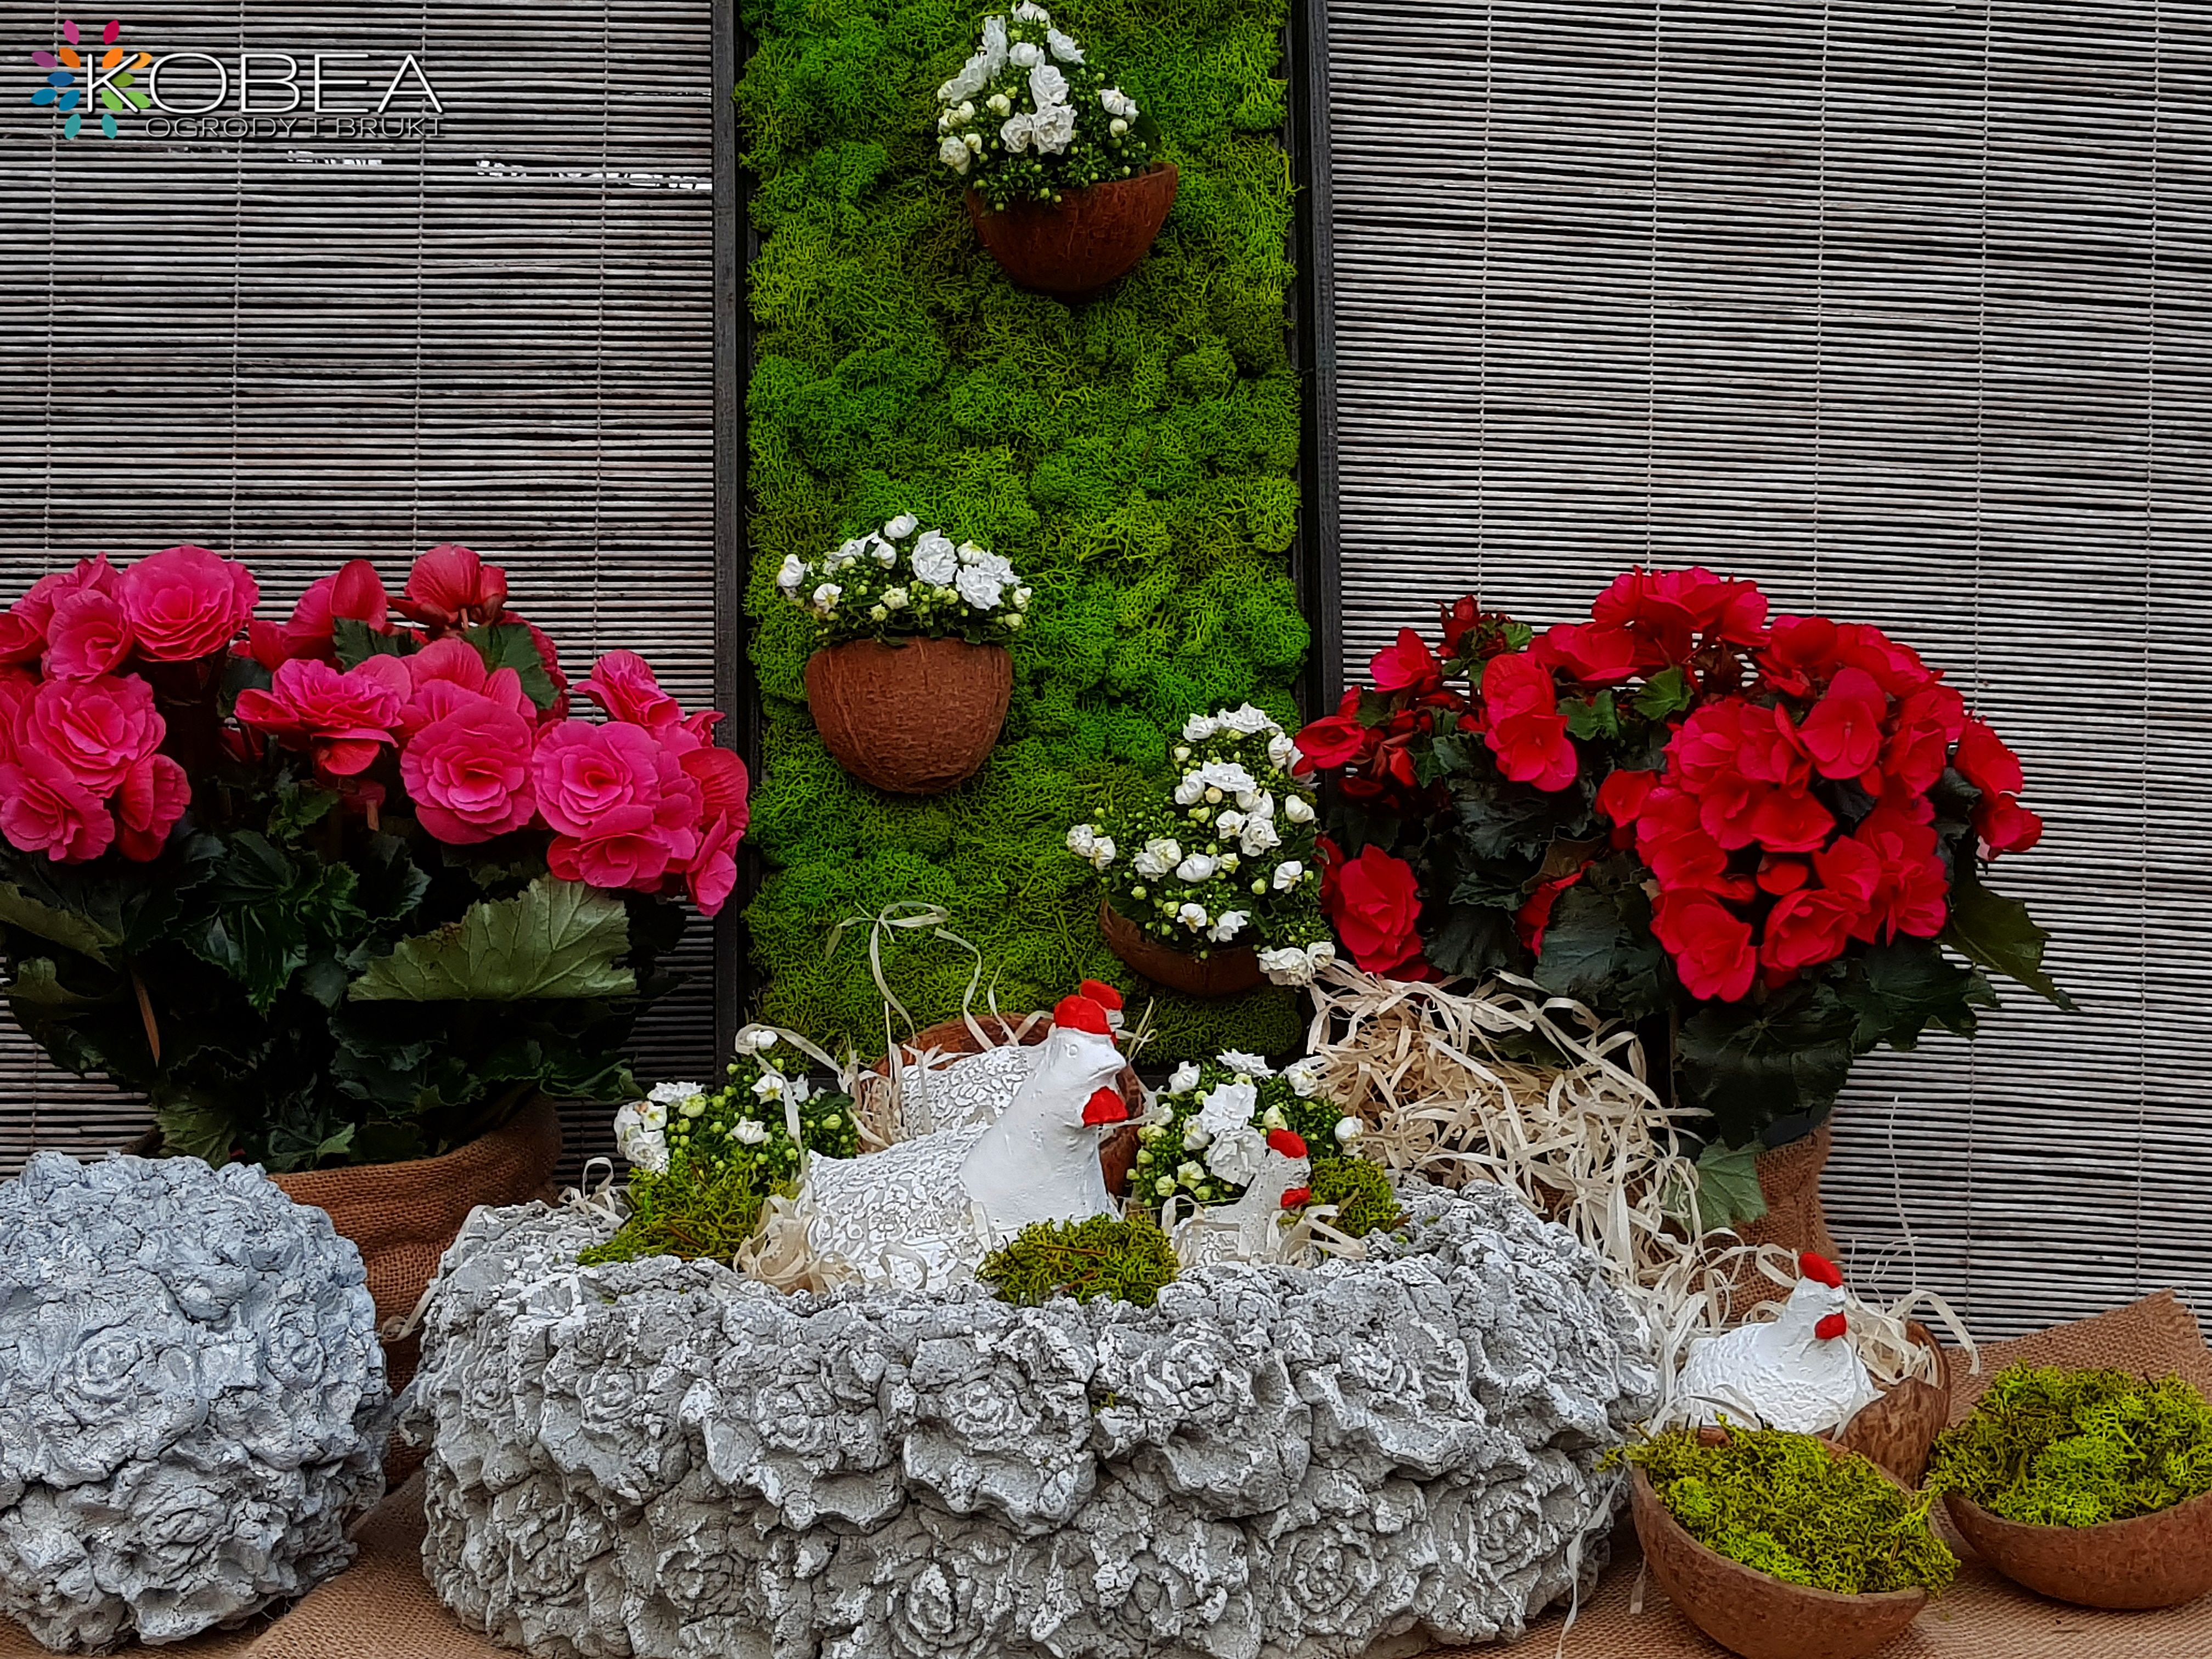 Wiosenne Dekoracje Do Ogrodu Kobea Ogrody I Bruki In 2020 Garden Ornaments Concrete Patio Patio